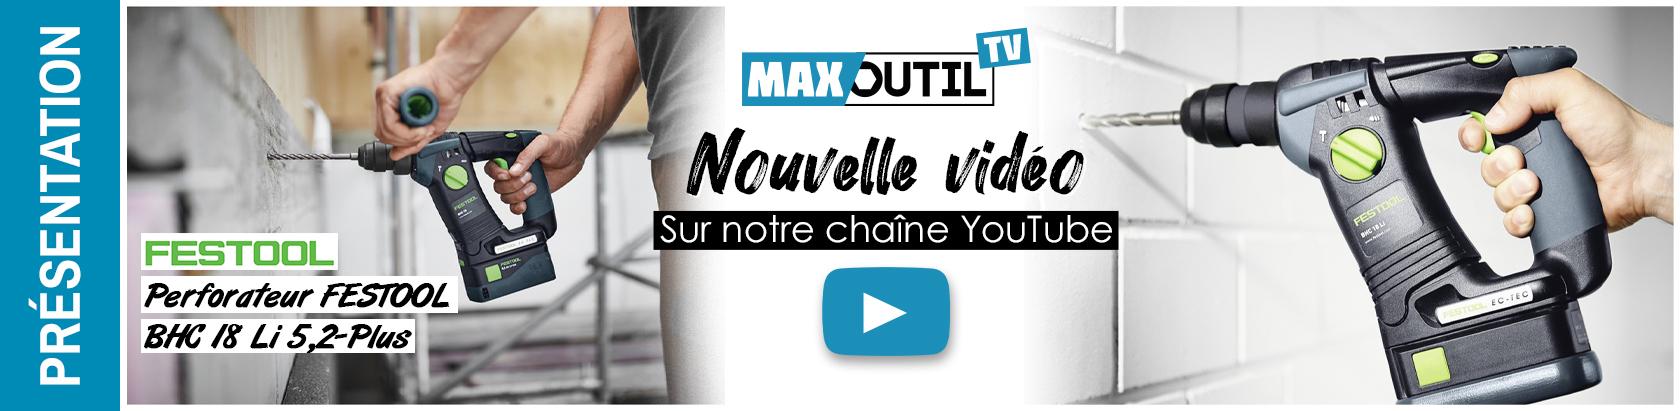 Maxoutil BHC18 Festool